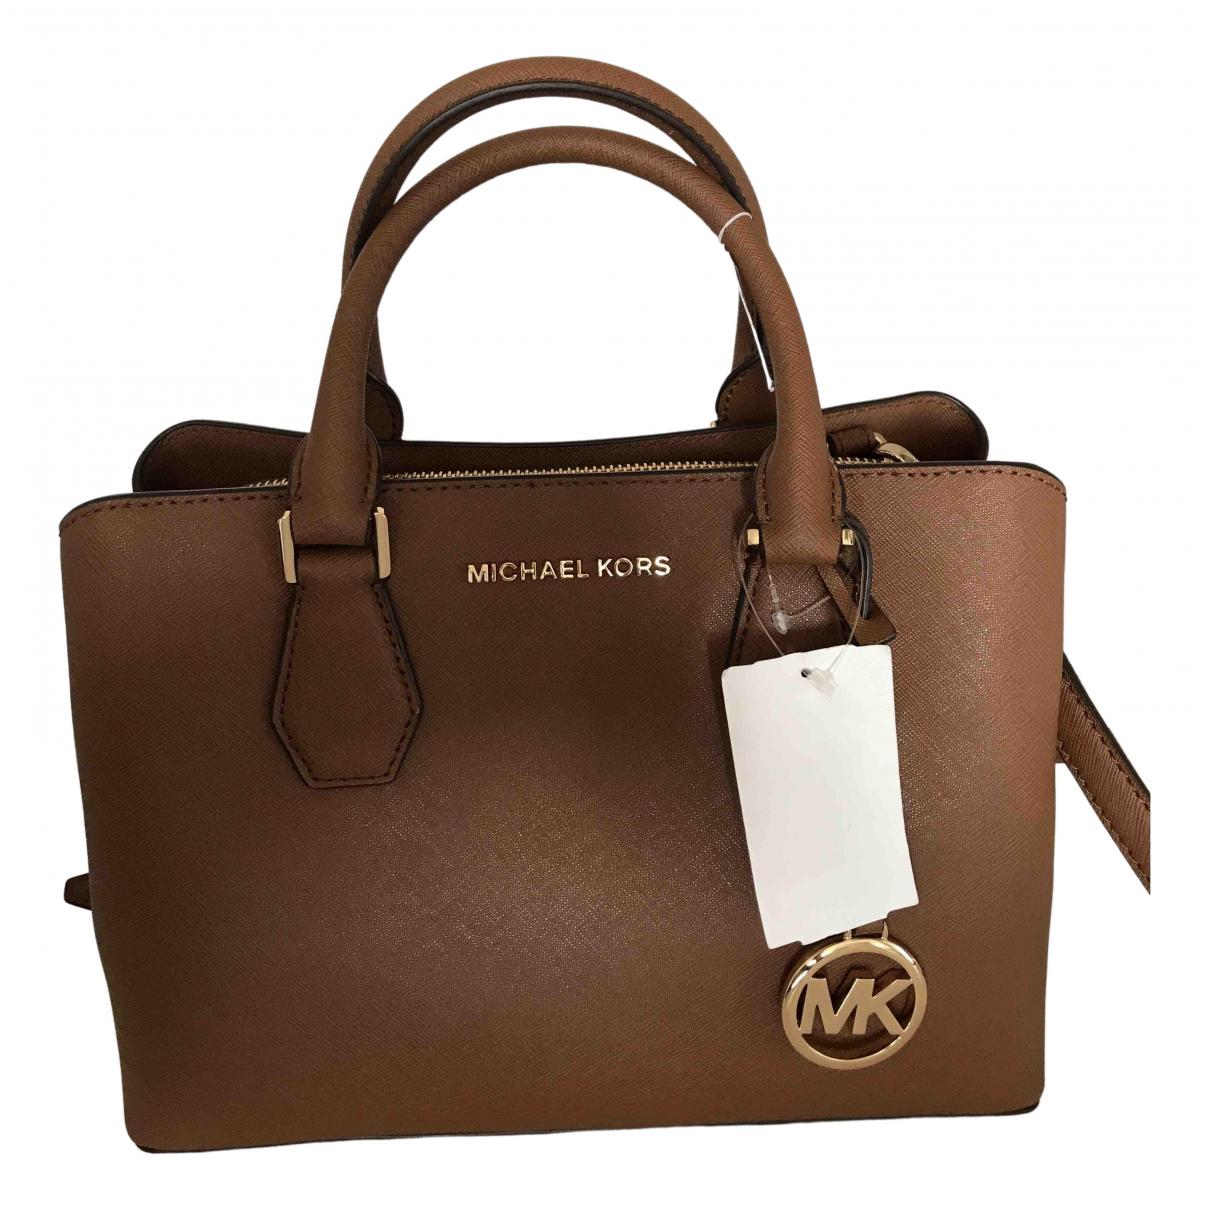 Michael Kors \N Handtasche in  Braun Leder